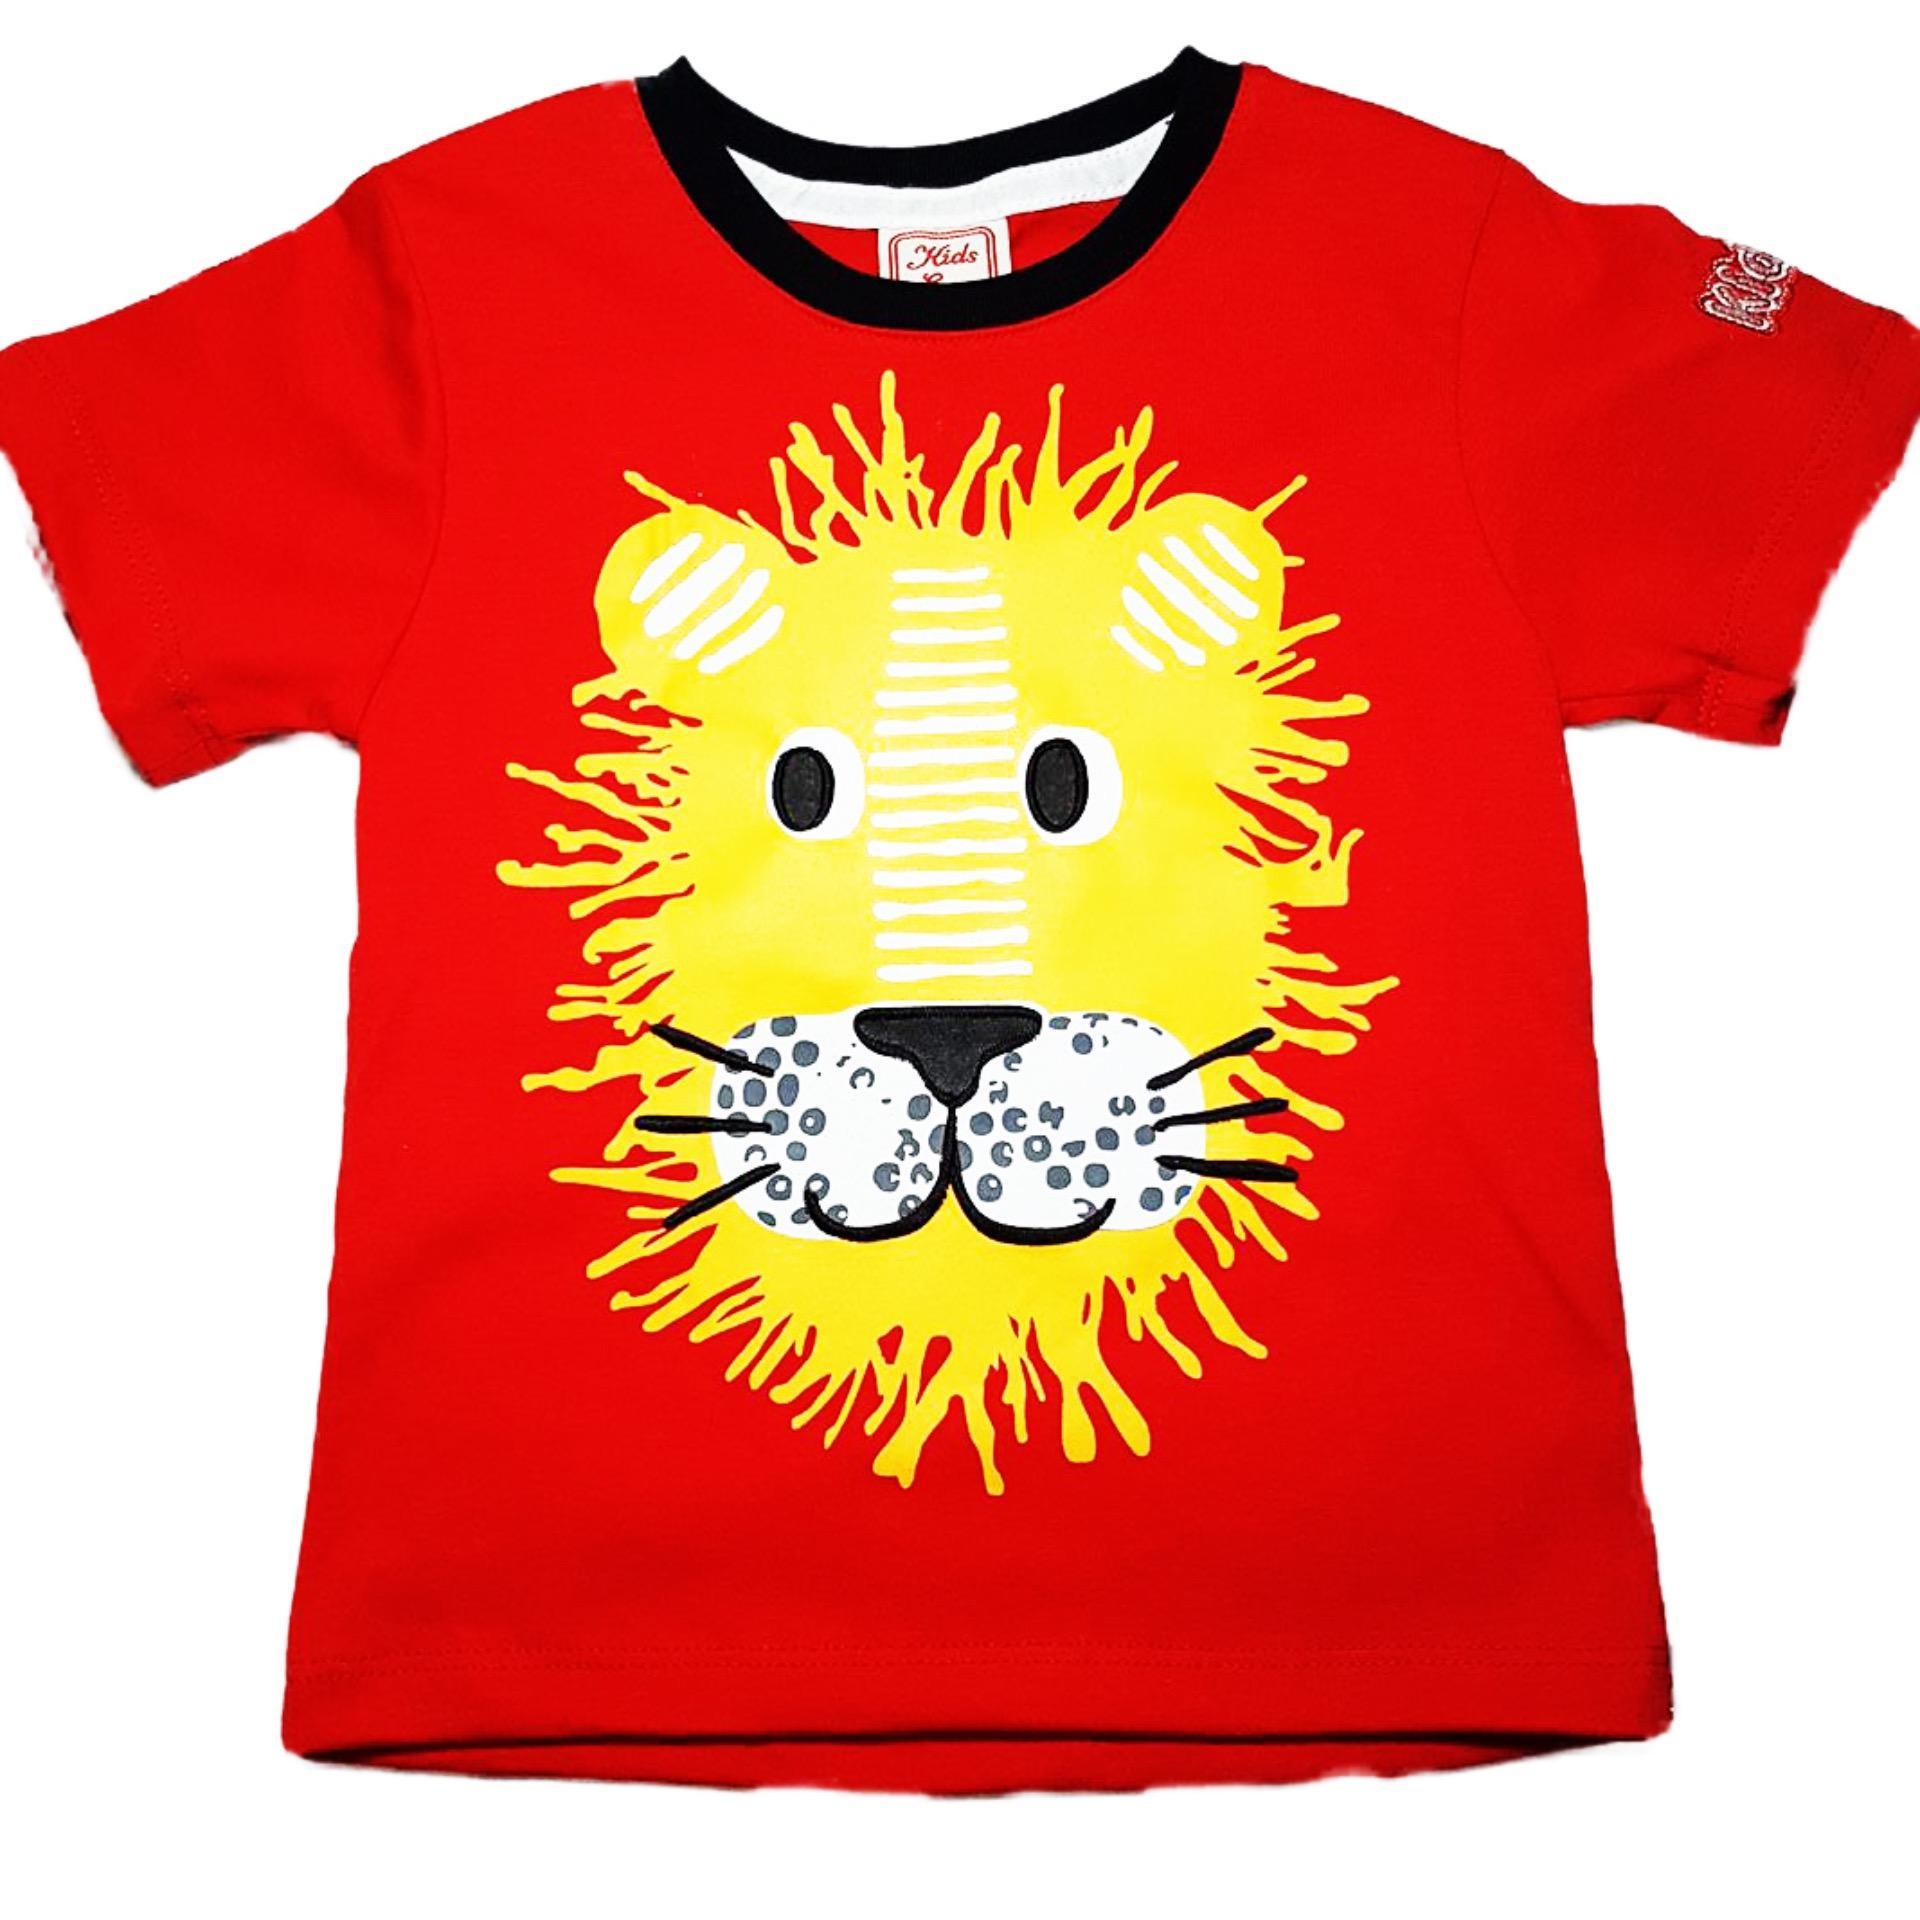 sebastian scuderia vettel dp soccer shirt men puma s t sponsors formula team clothes red santander style ferrari kids